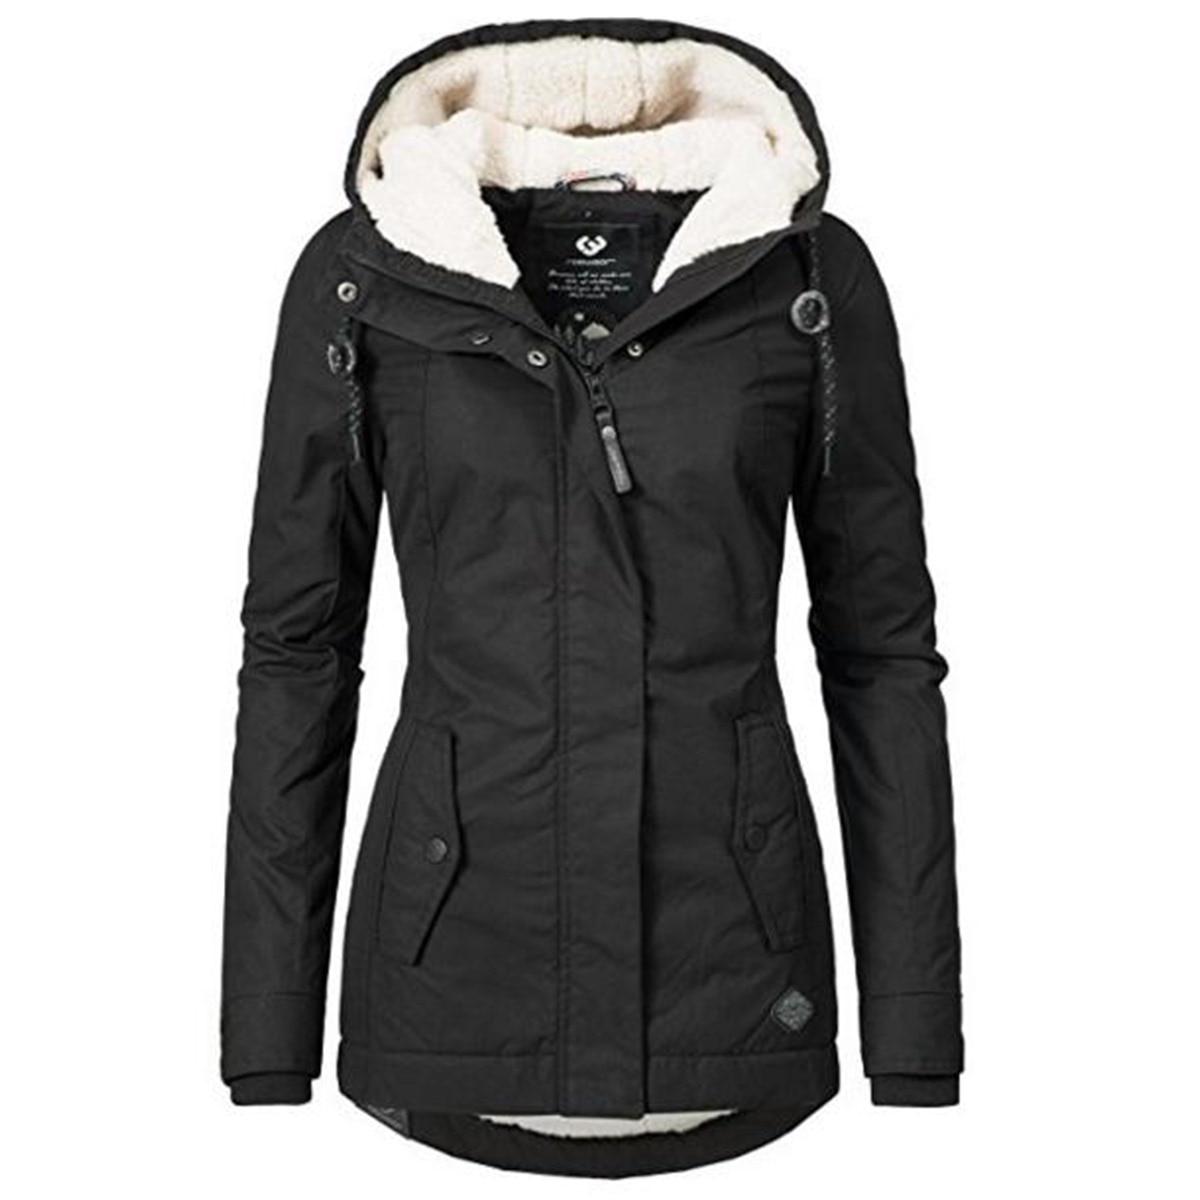 Black Cotton Coats Women Casual Hooded Jacket Coat Fashion Simple High Street Slim 2018 Winter Warm Thicken Basic Tops Female